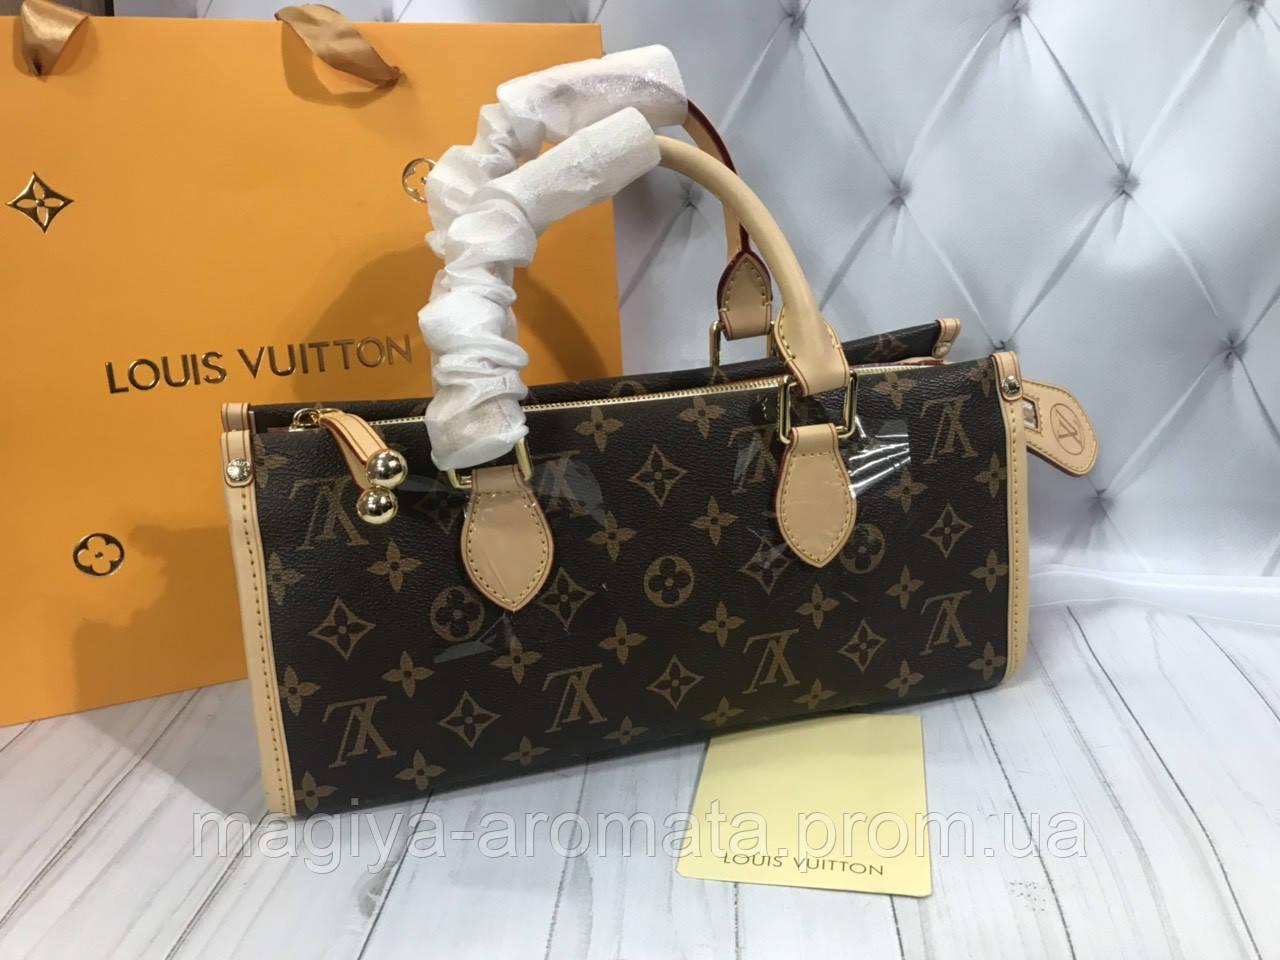 7f25177a56b0 Клатч Louis Vuitton Clutch Lux Натуральная Кожа Канва — в Категории ...